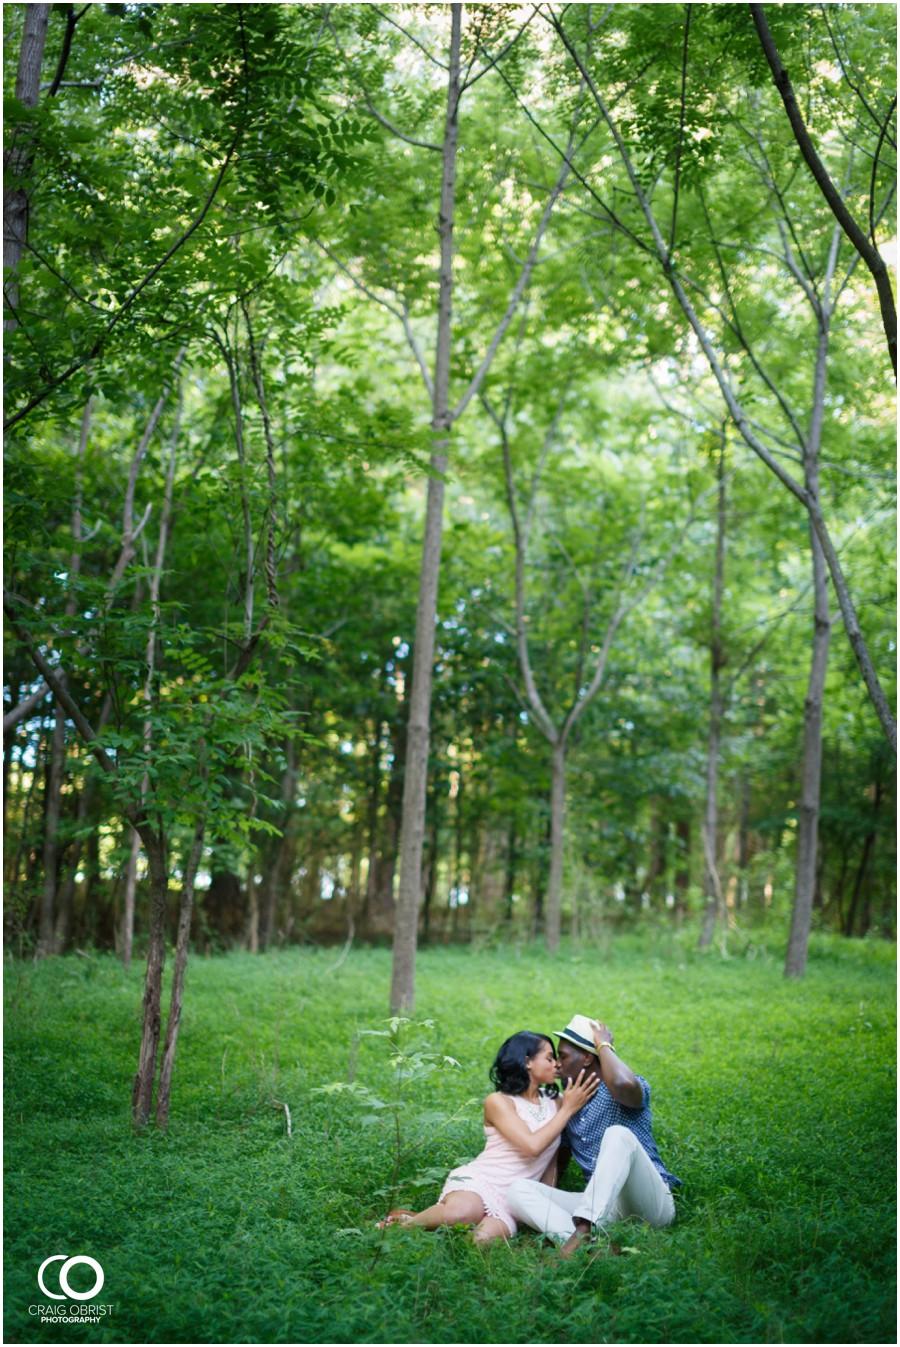 McDaniel-Farm-Park-Engagement-Portraits-Buckhead_0009.jpg